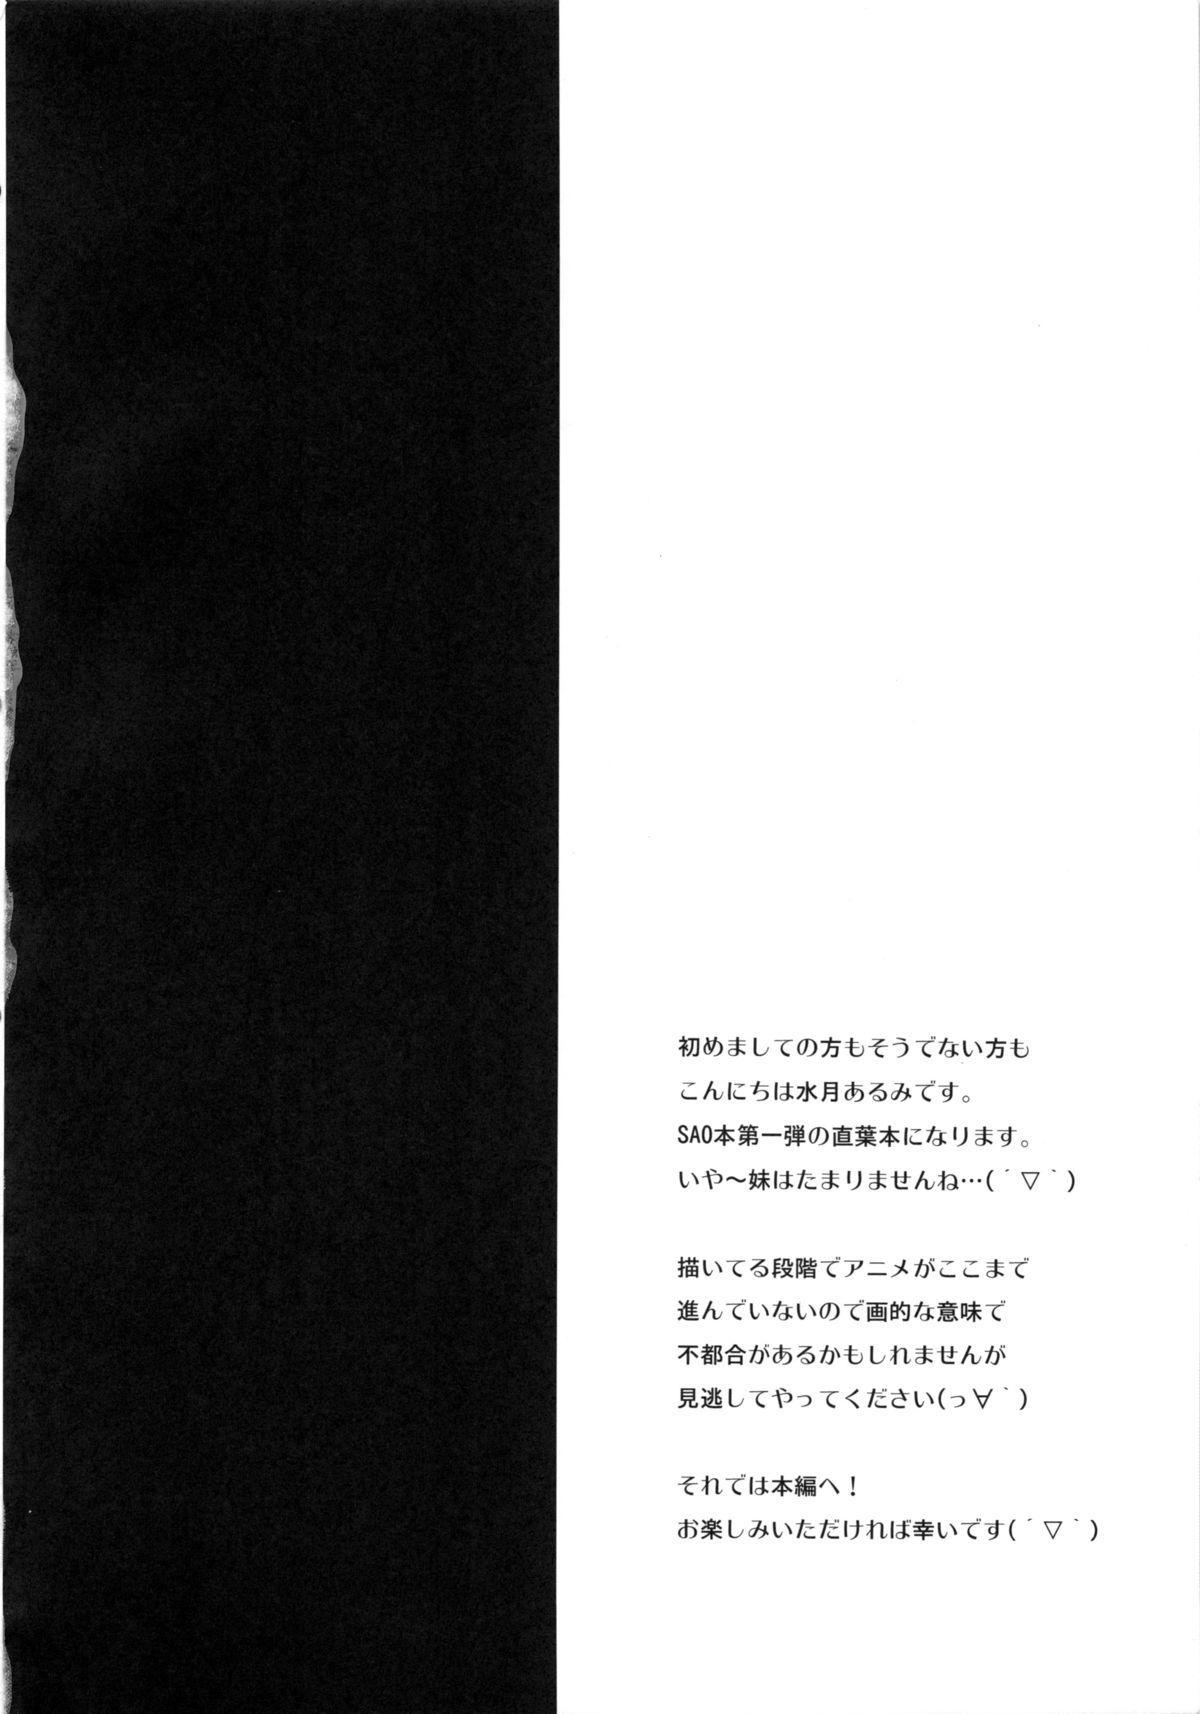 Ichiya Renka 2